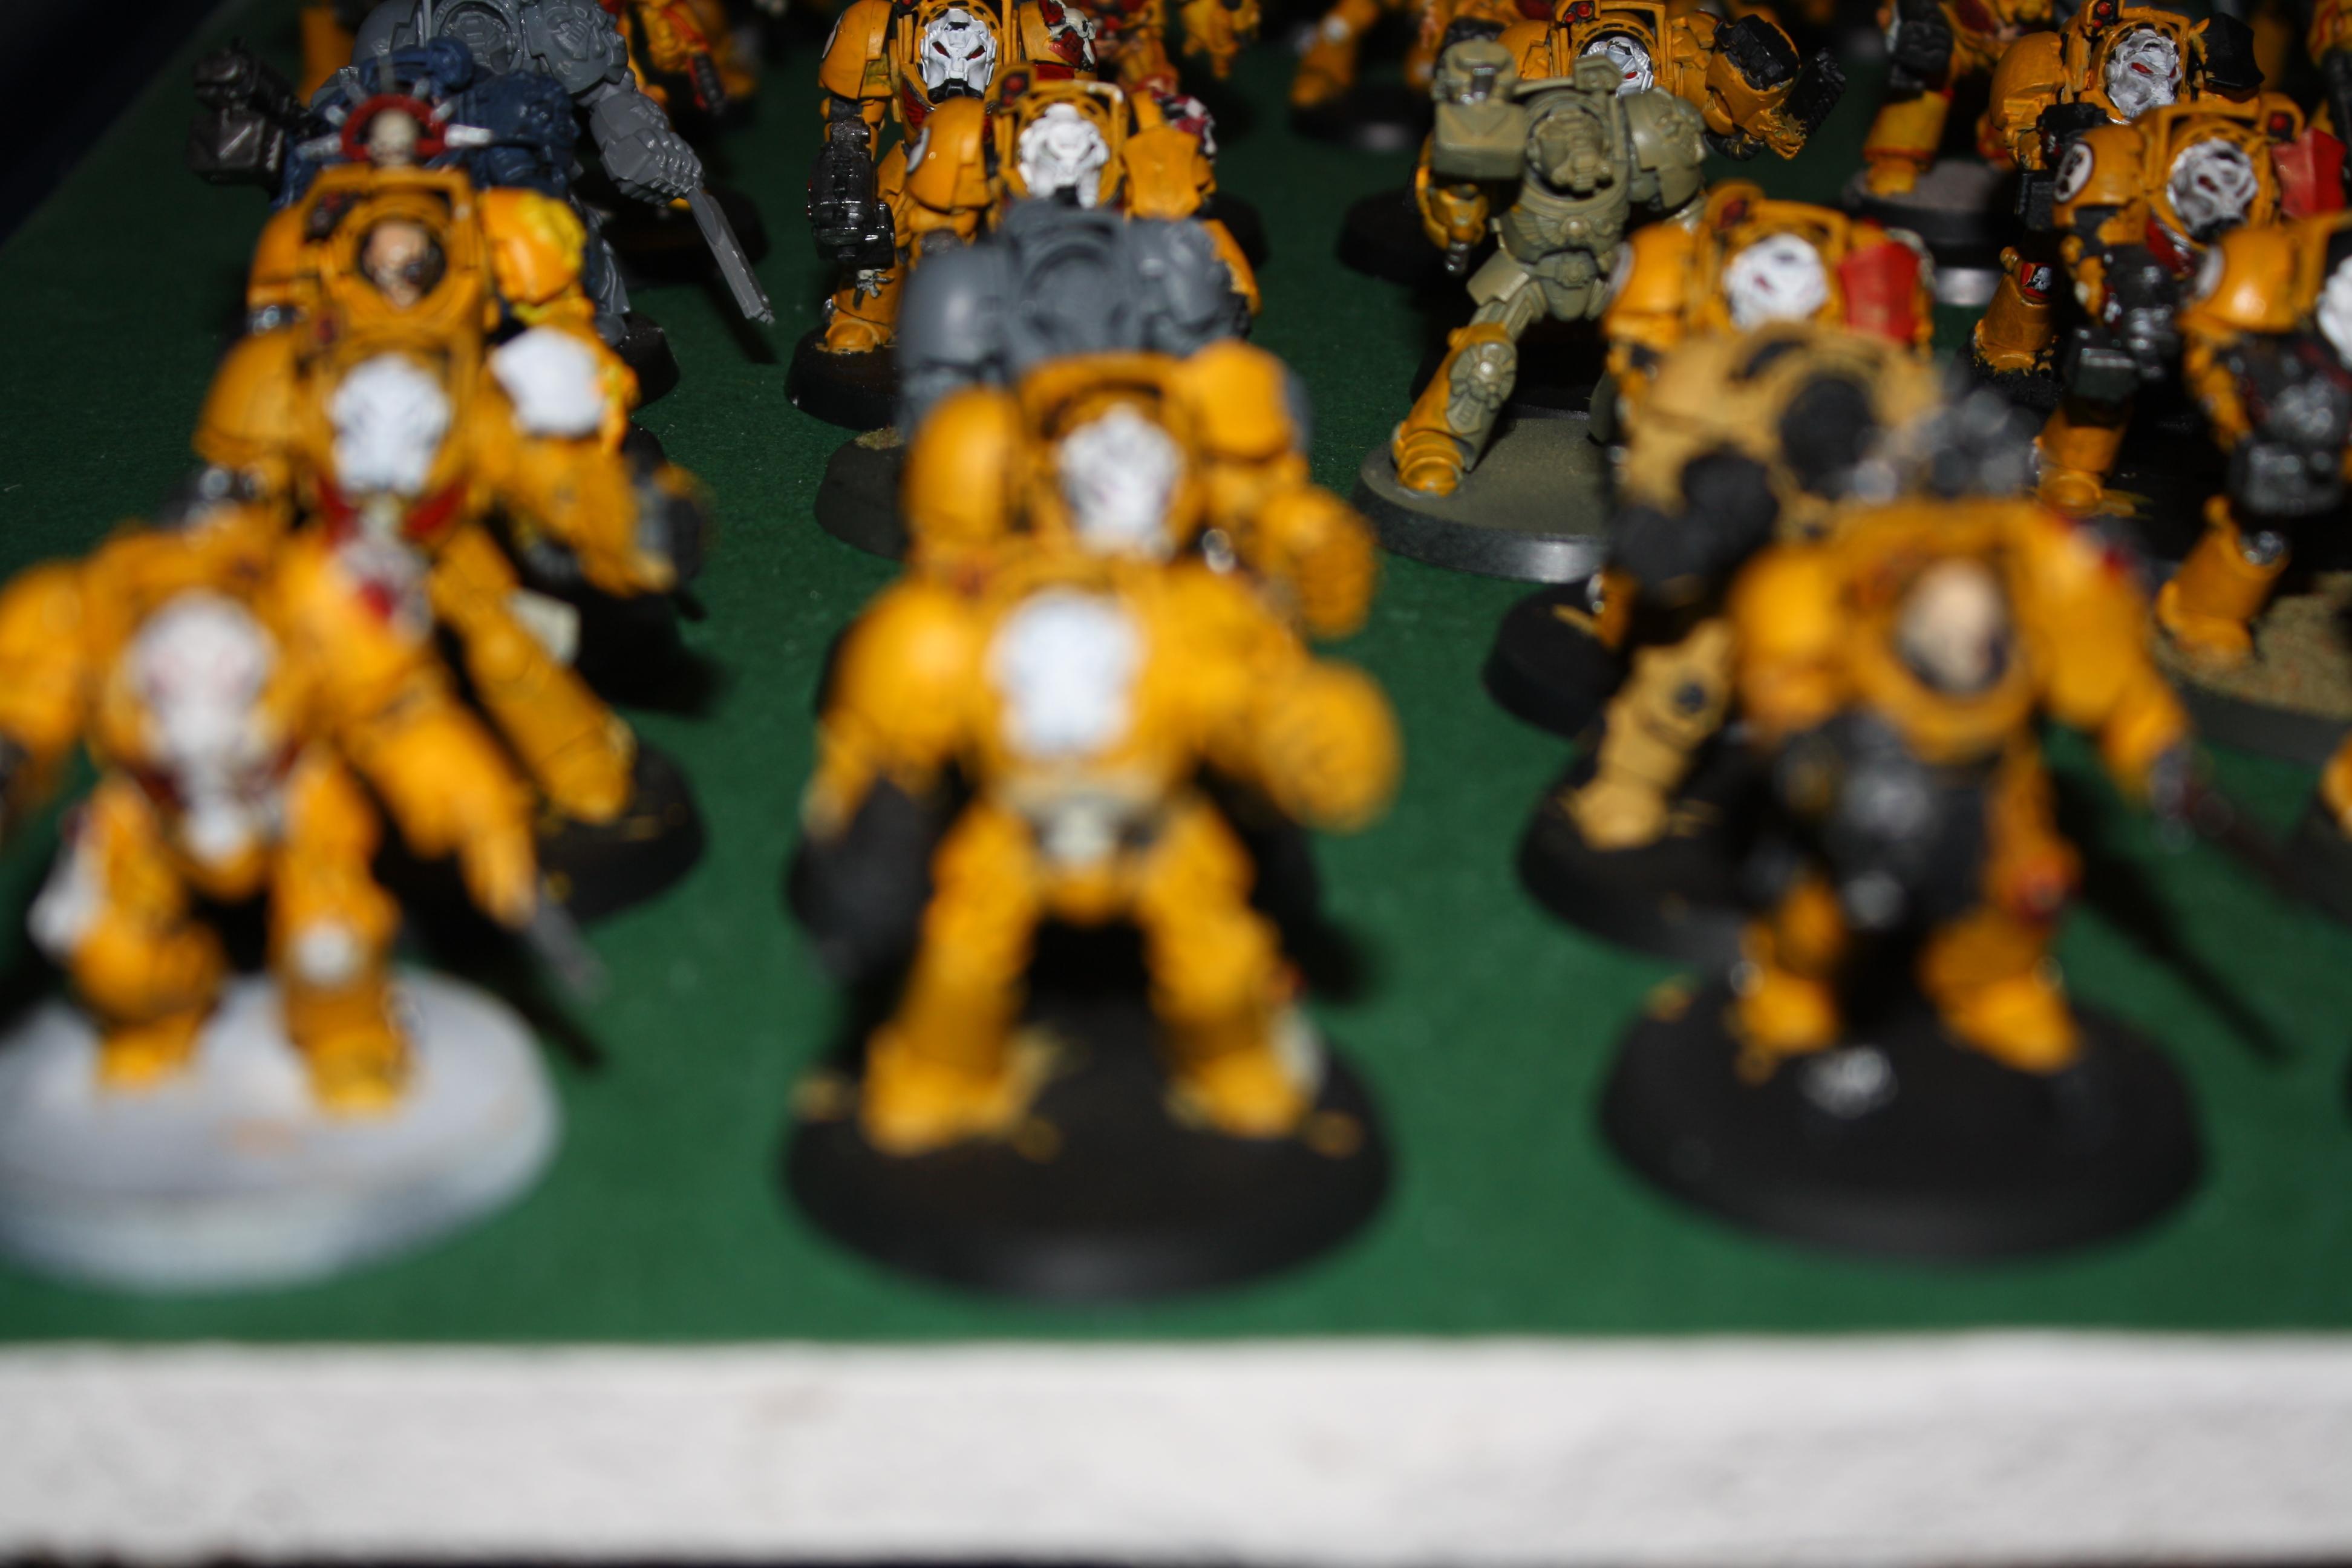 Pip, Space Marines, Terminator Armor, Warhammer 40,000, Whole Army